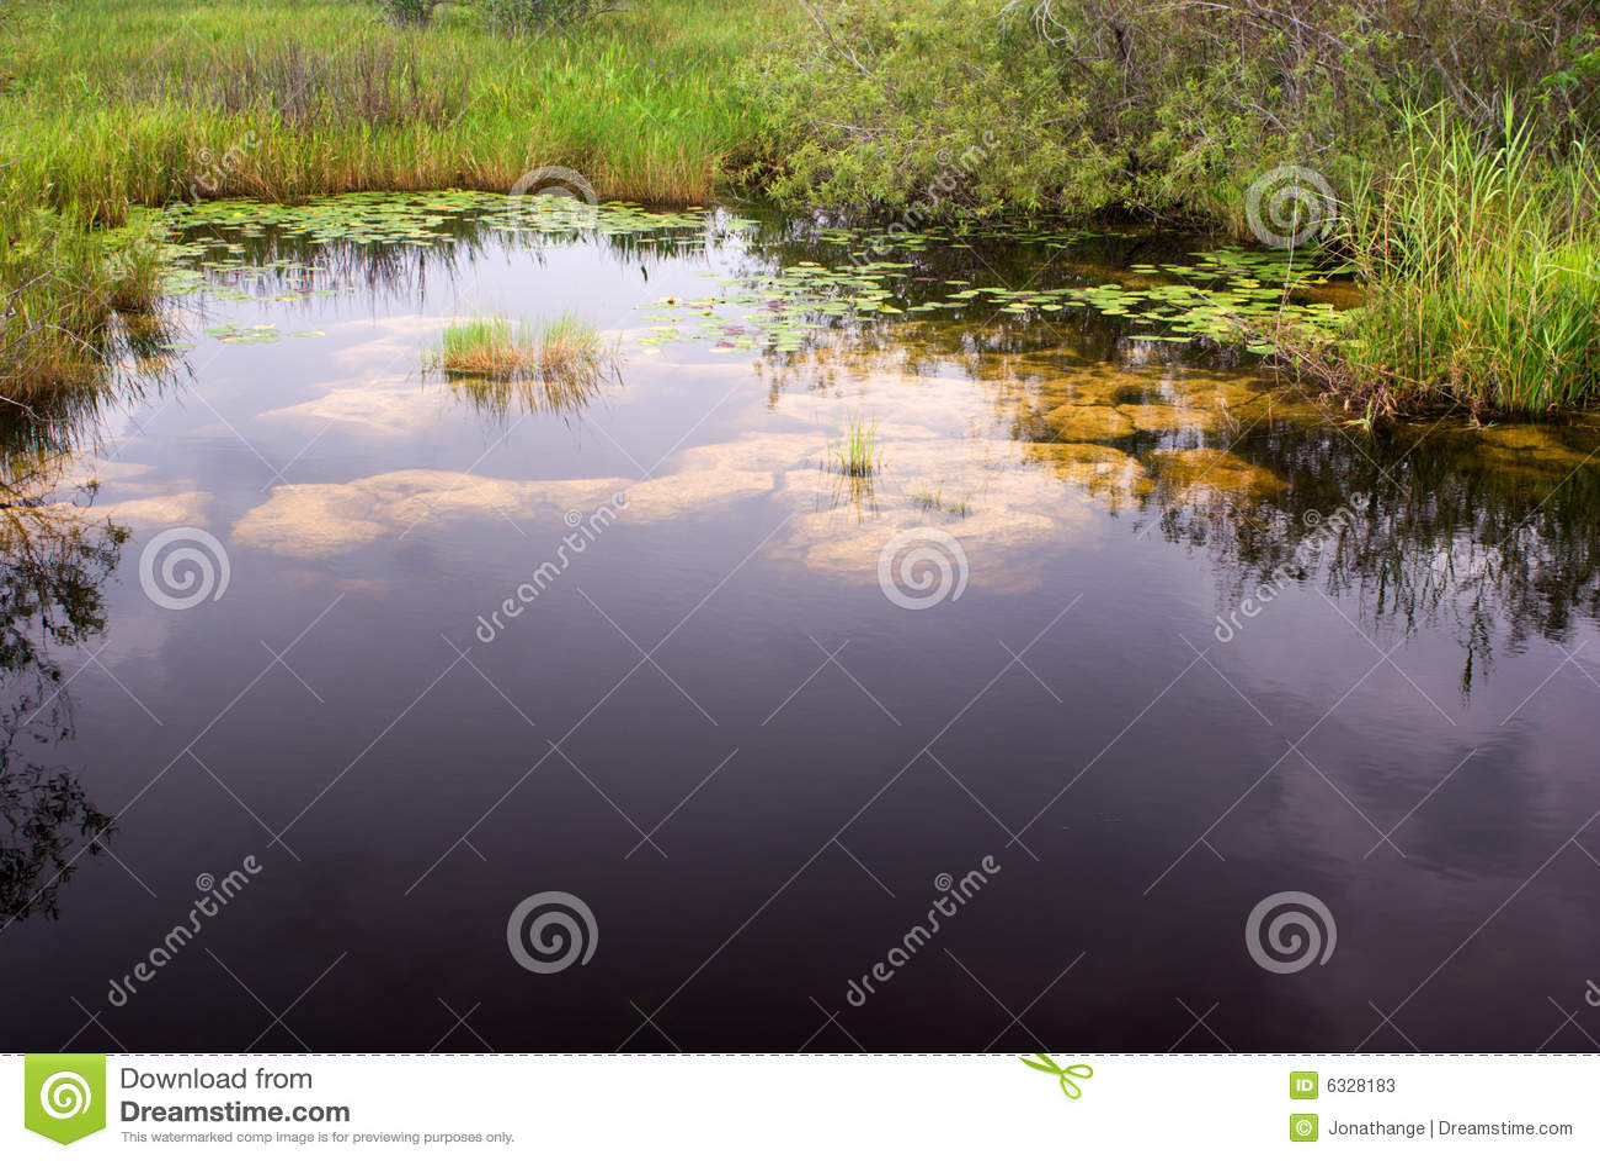 Everglades Canal Landscape